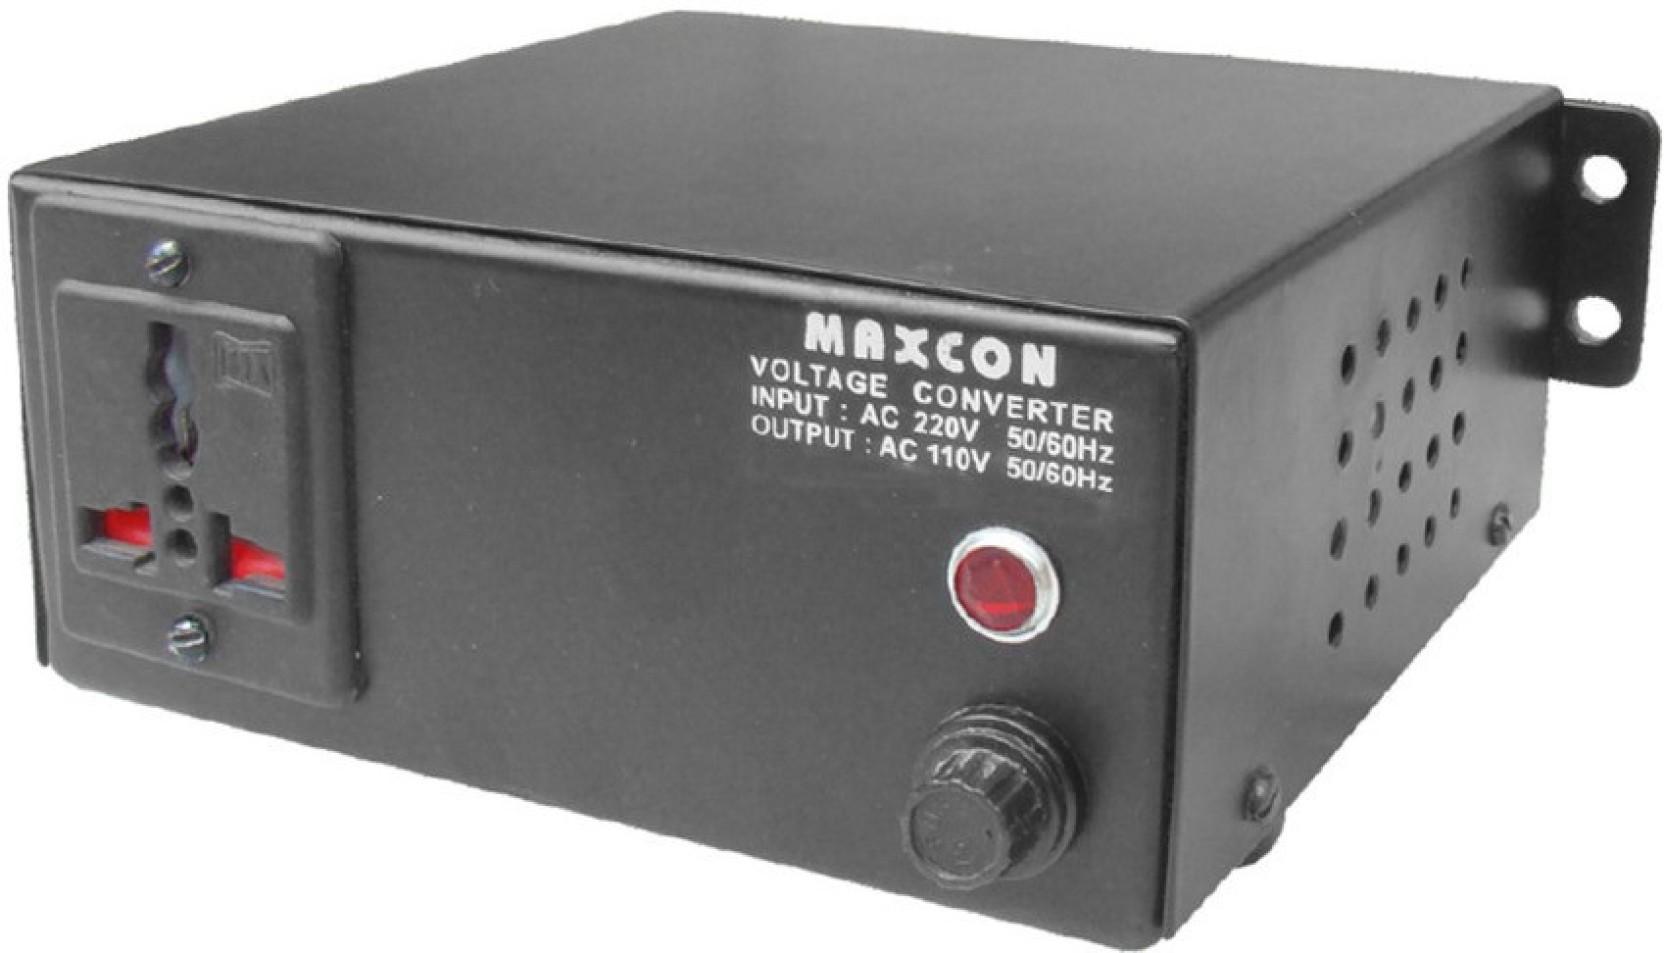 Mx 220v To 110v Voltage Converter  500 Watts  1 Socket Surge Protector Price In India